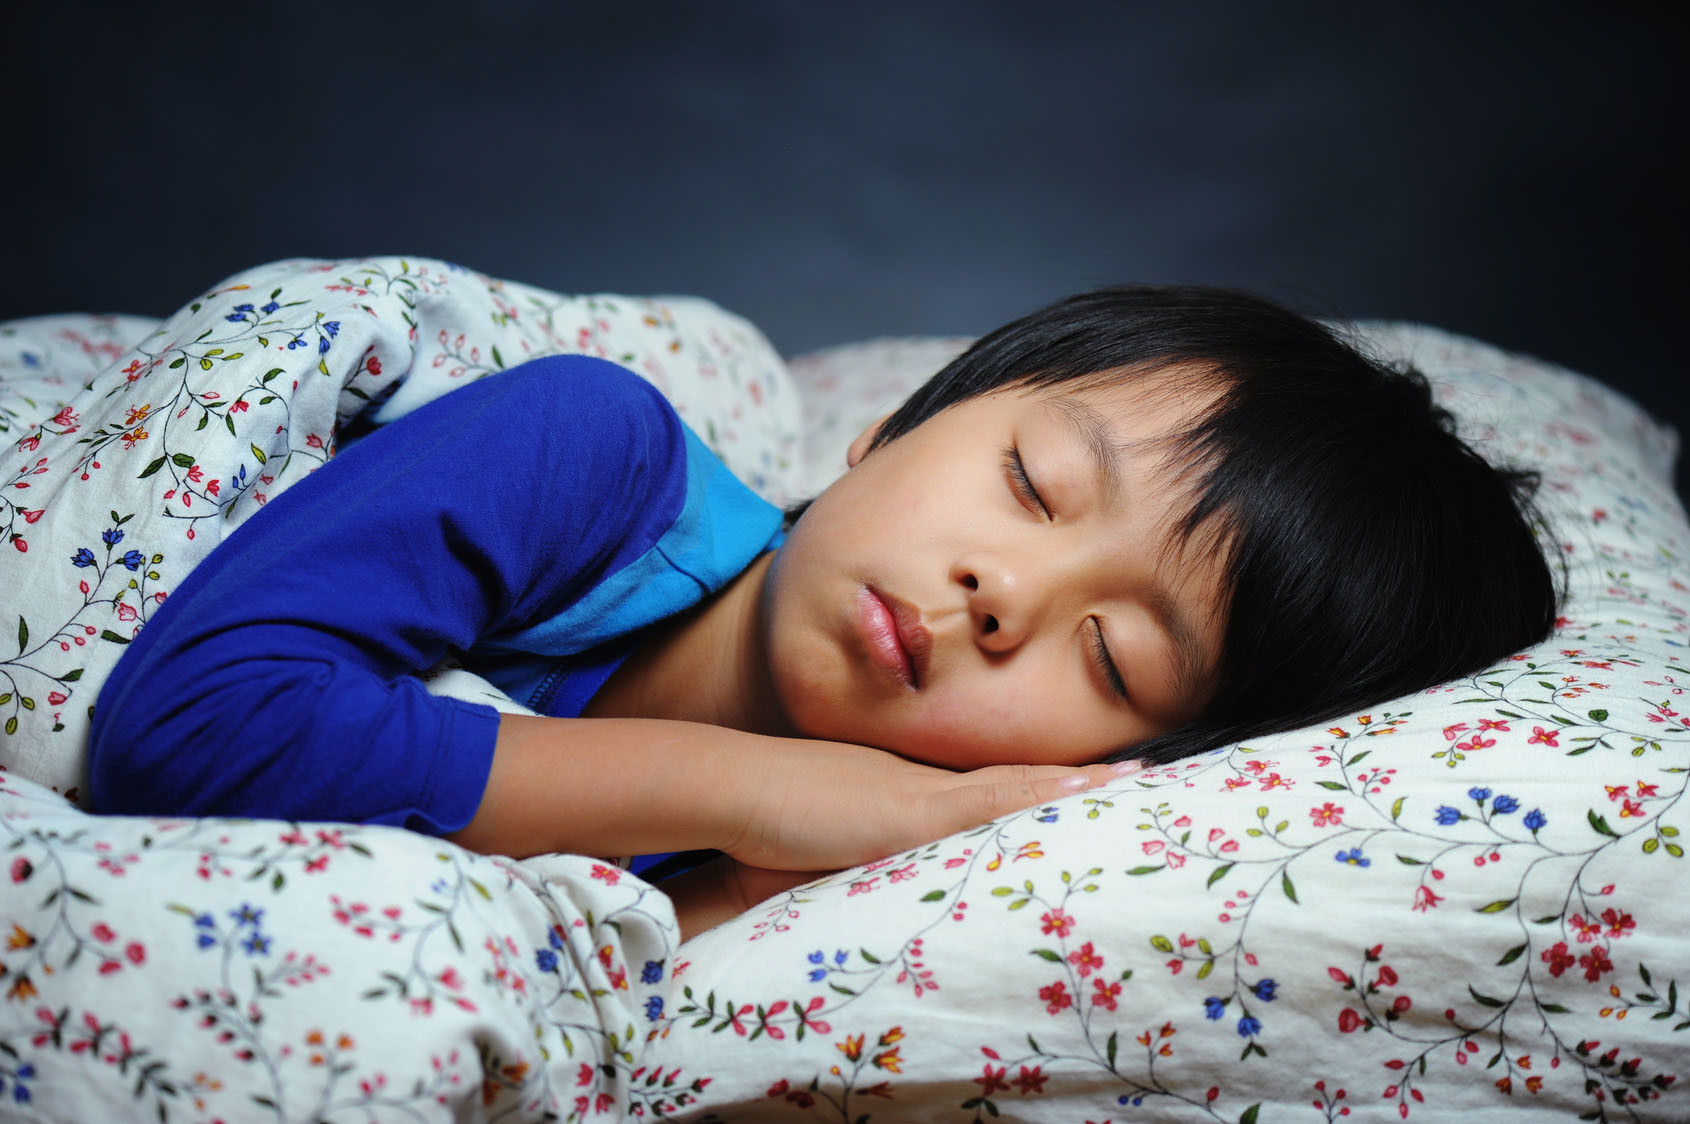 Picnf5ylzs5nj1ayzaiof9cojsamkzinf8mawv1agnmamn3agngzp0ky3zgoqrjzqnhnaoawildkin Kids Sleeping Bag W Travel Pillow